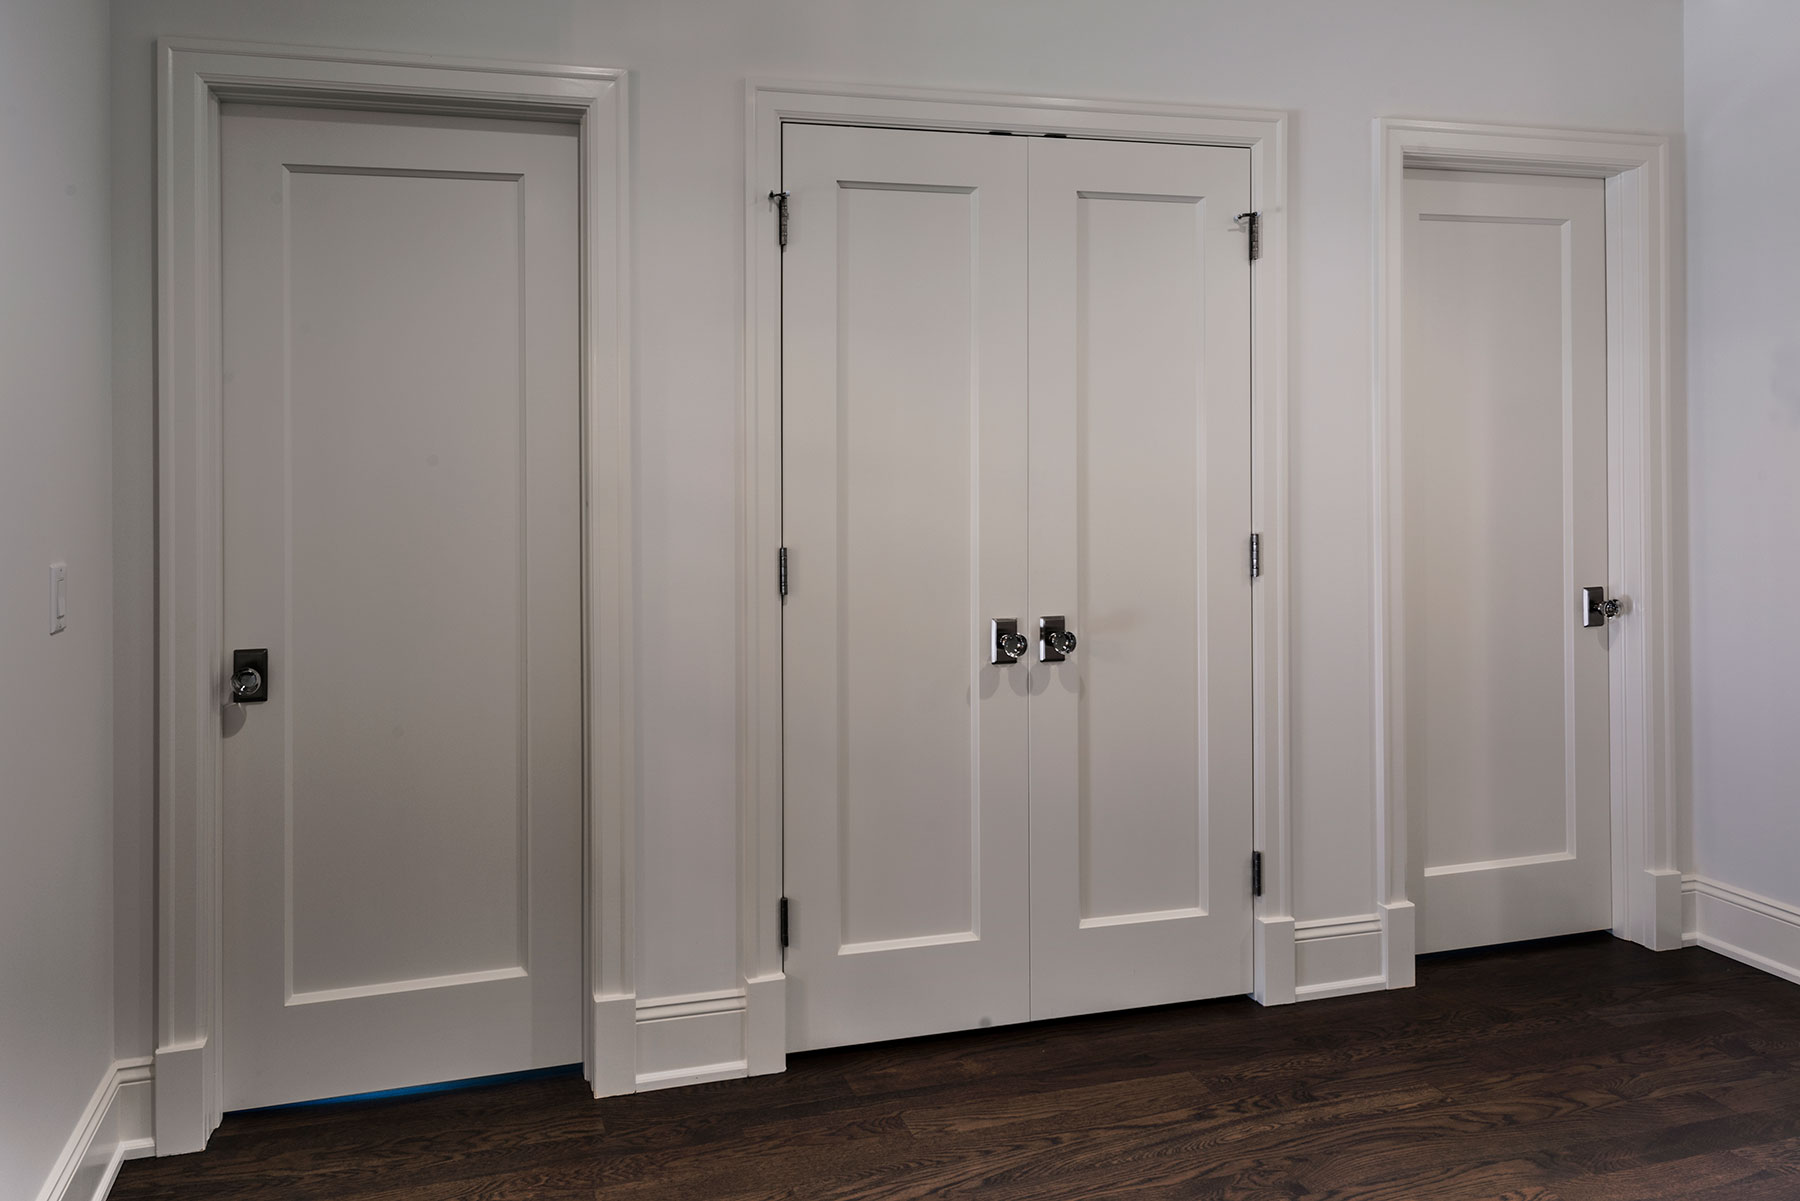 Custom Wood Interior Doors Single Panel Paint Grade Mdf For Closet And Bedroom Entrance